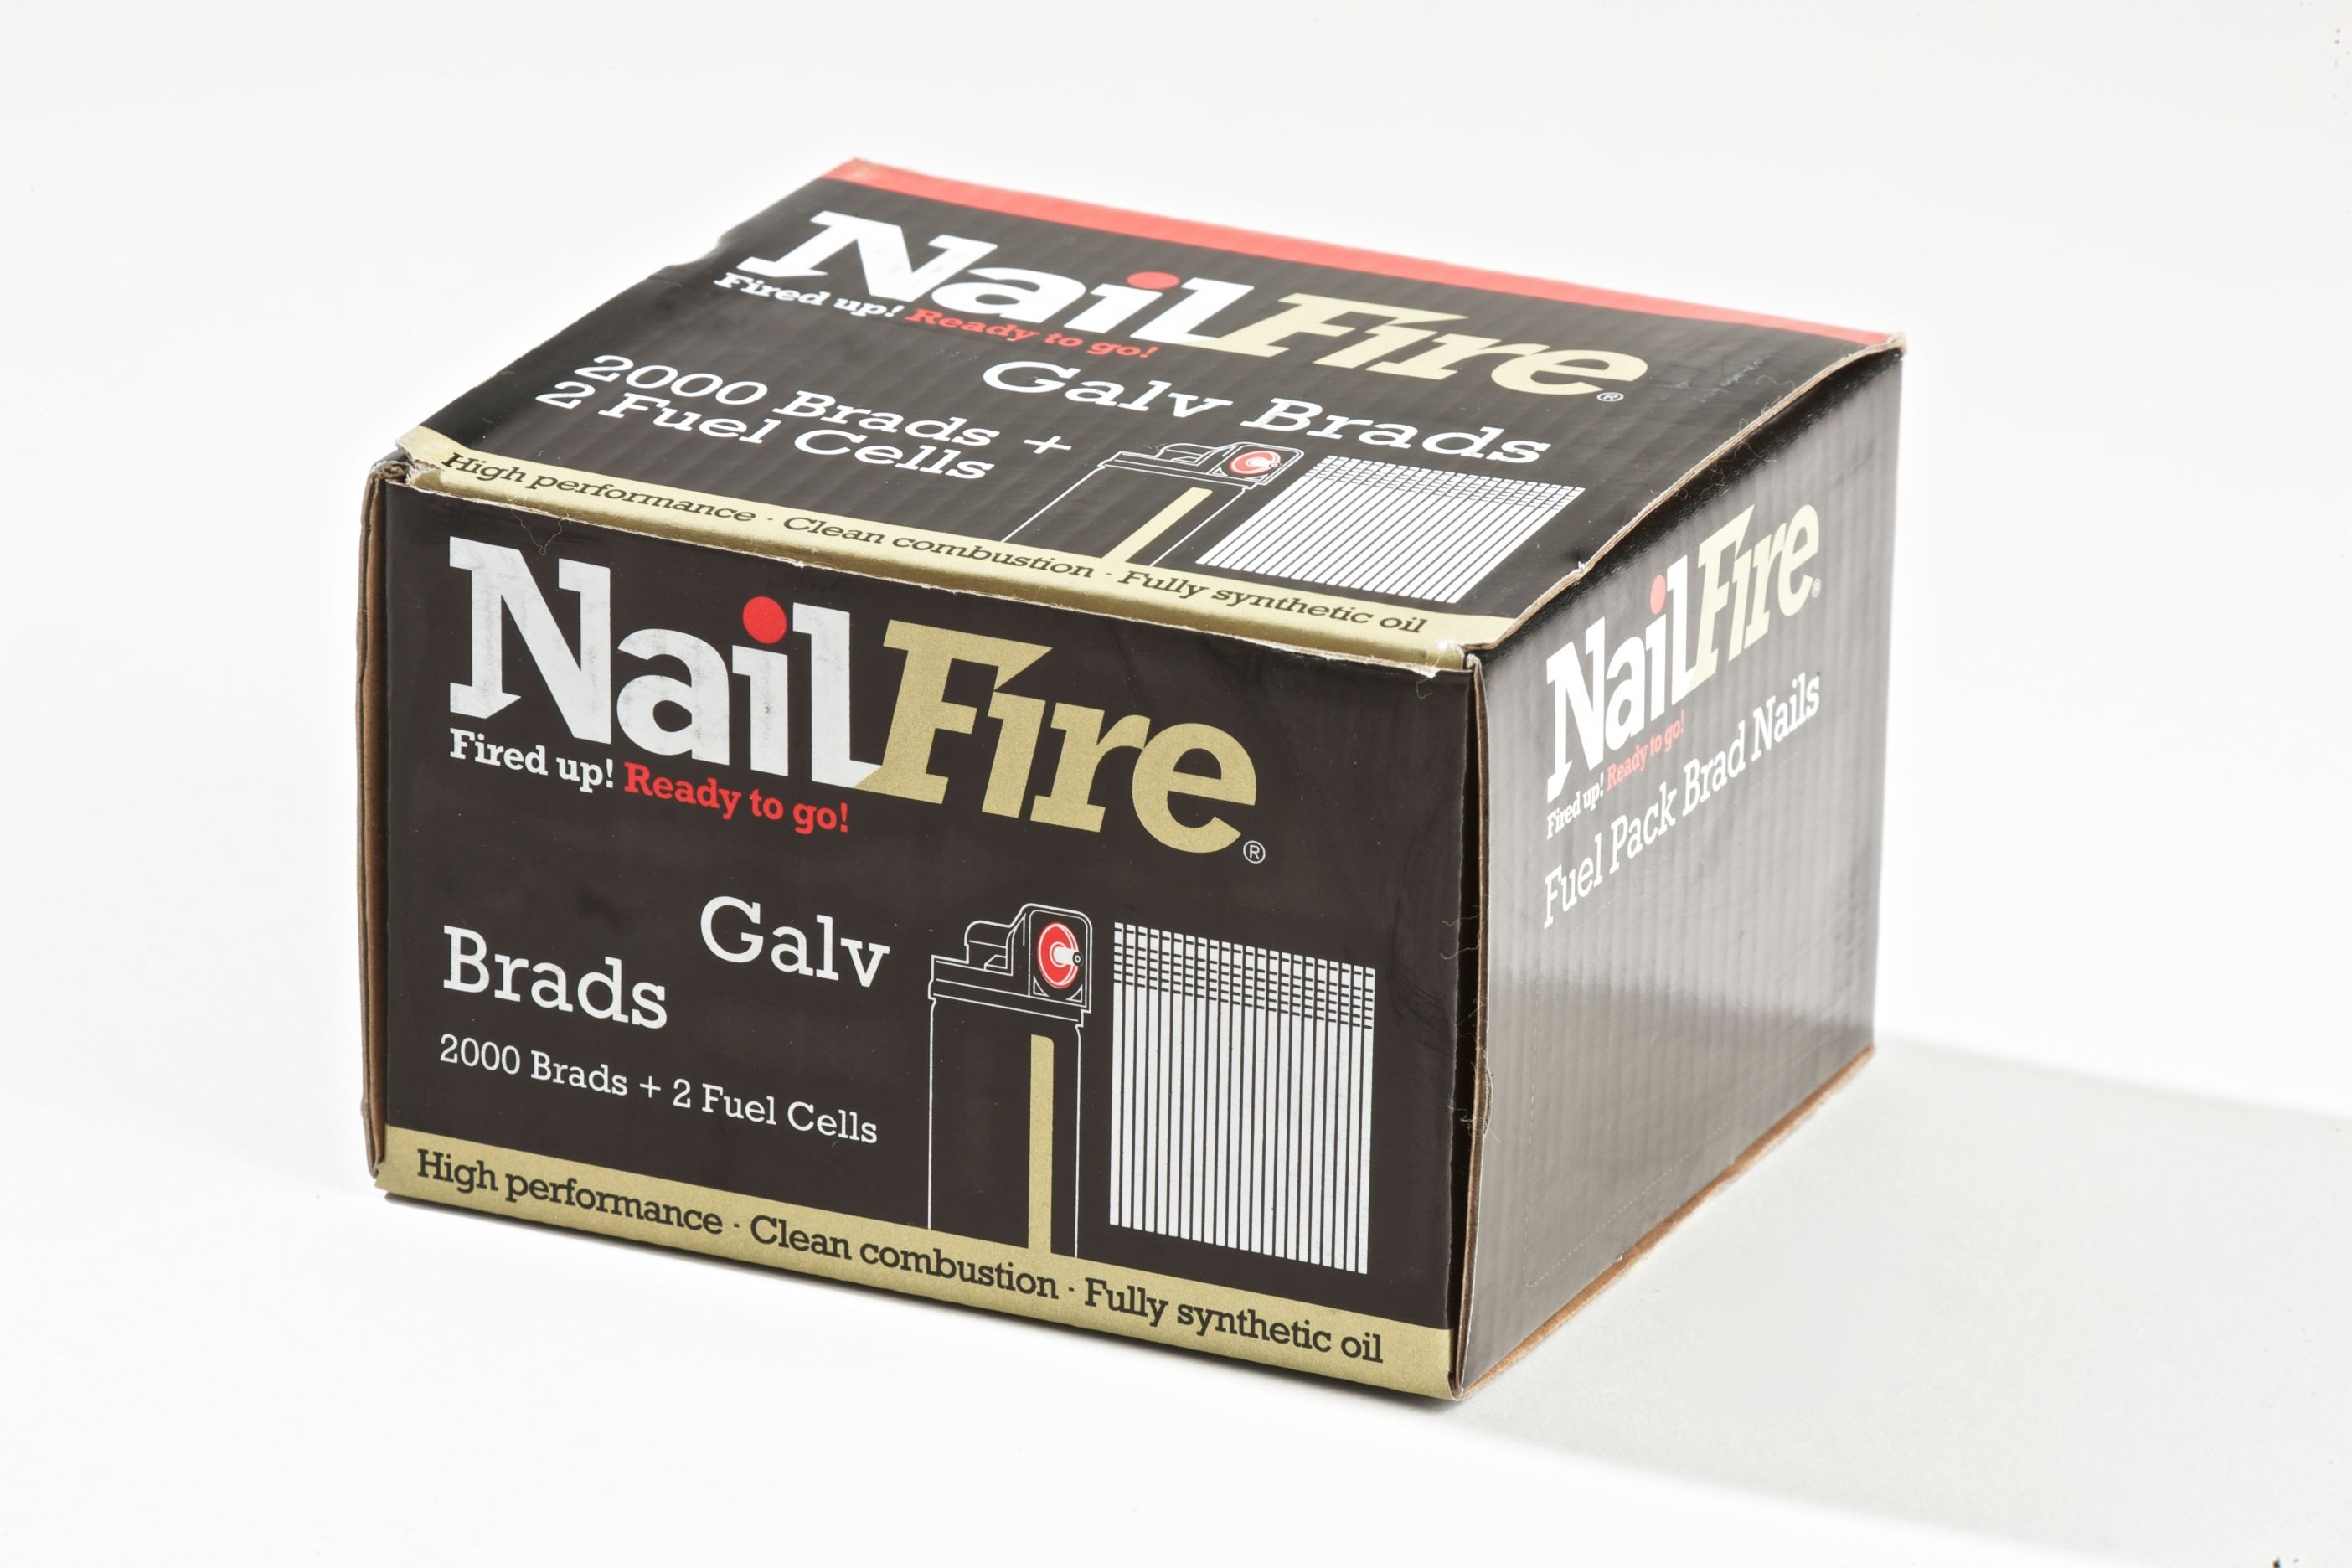 NAILFIRE 2ND FIX STRAIGHT E-GALV BRAD & FUEL PACK 64MM (TUB OF 2000)